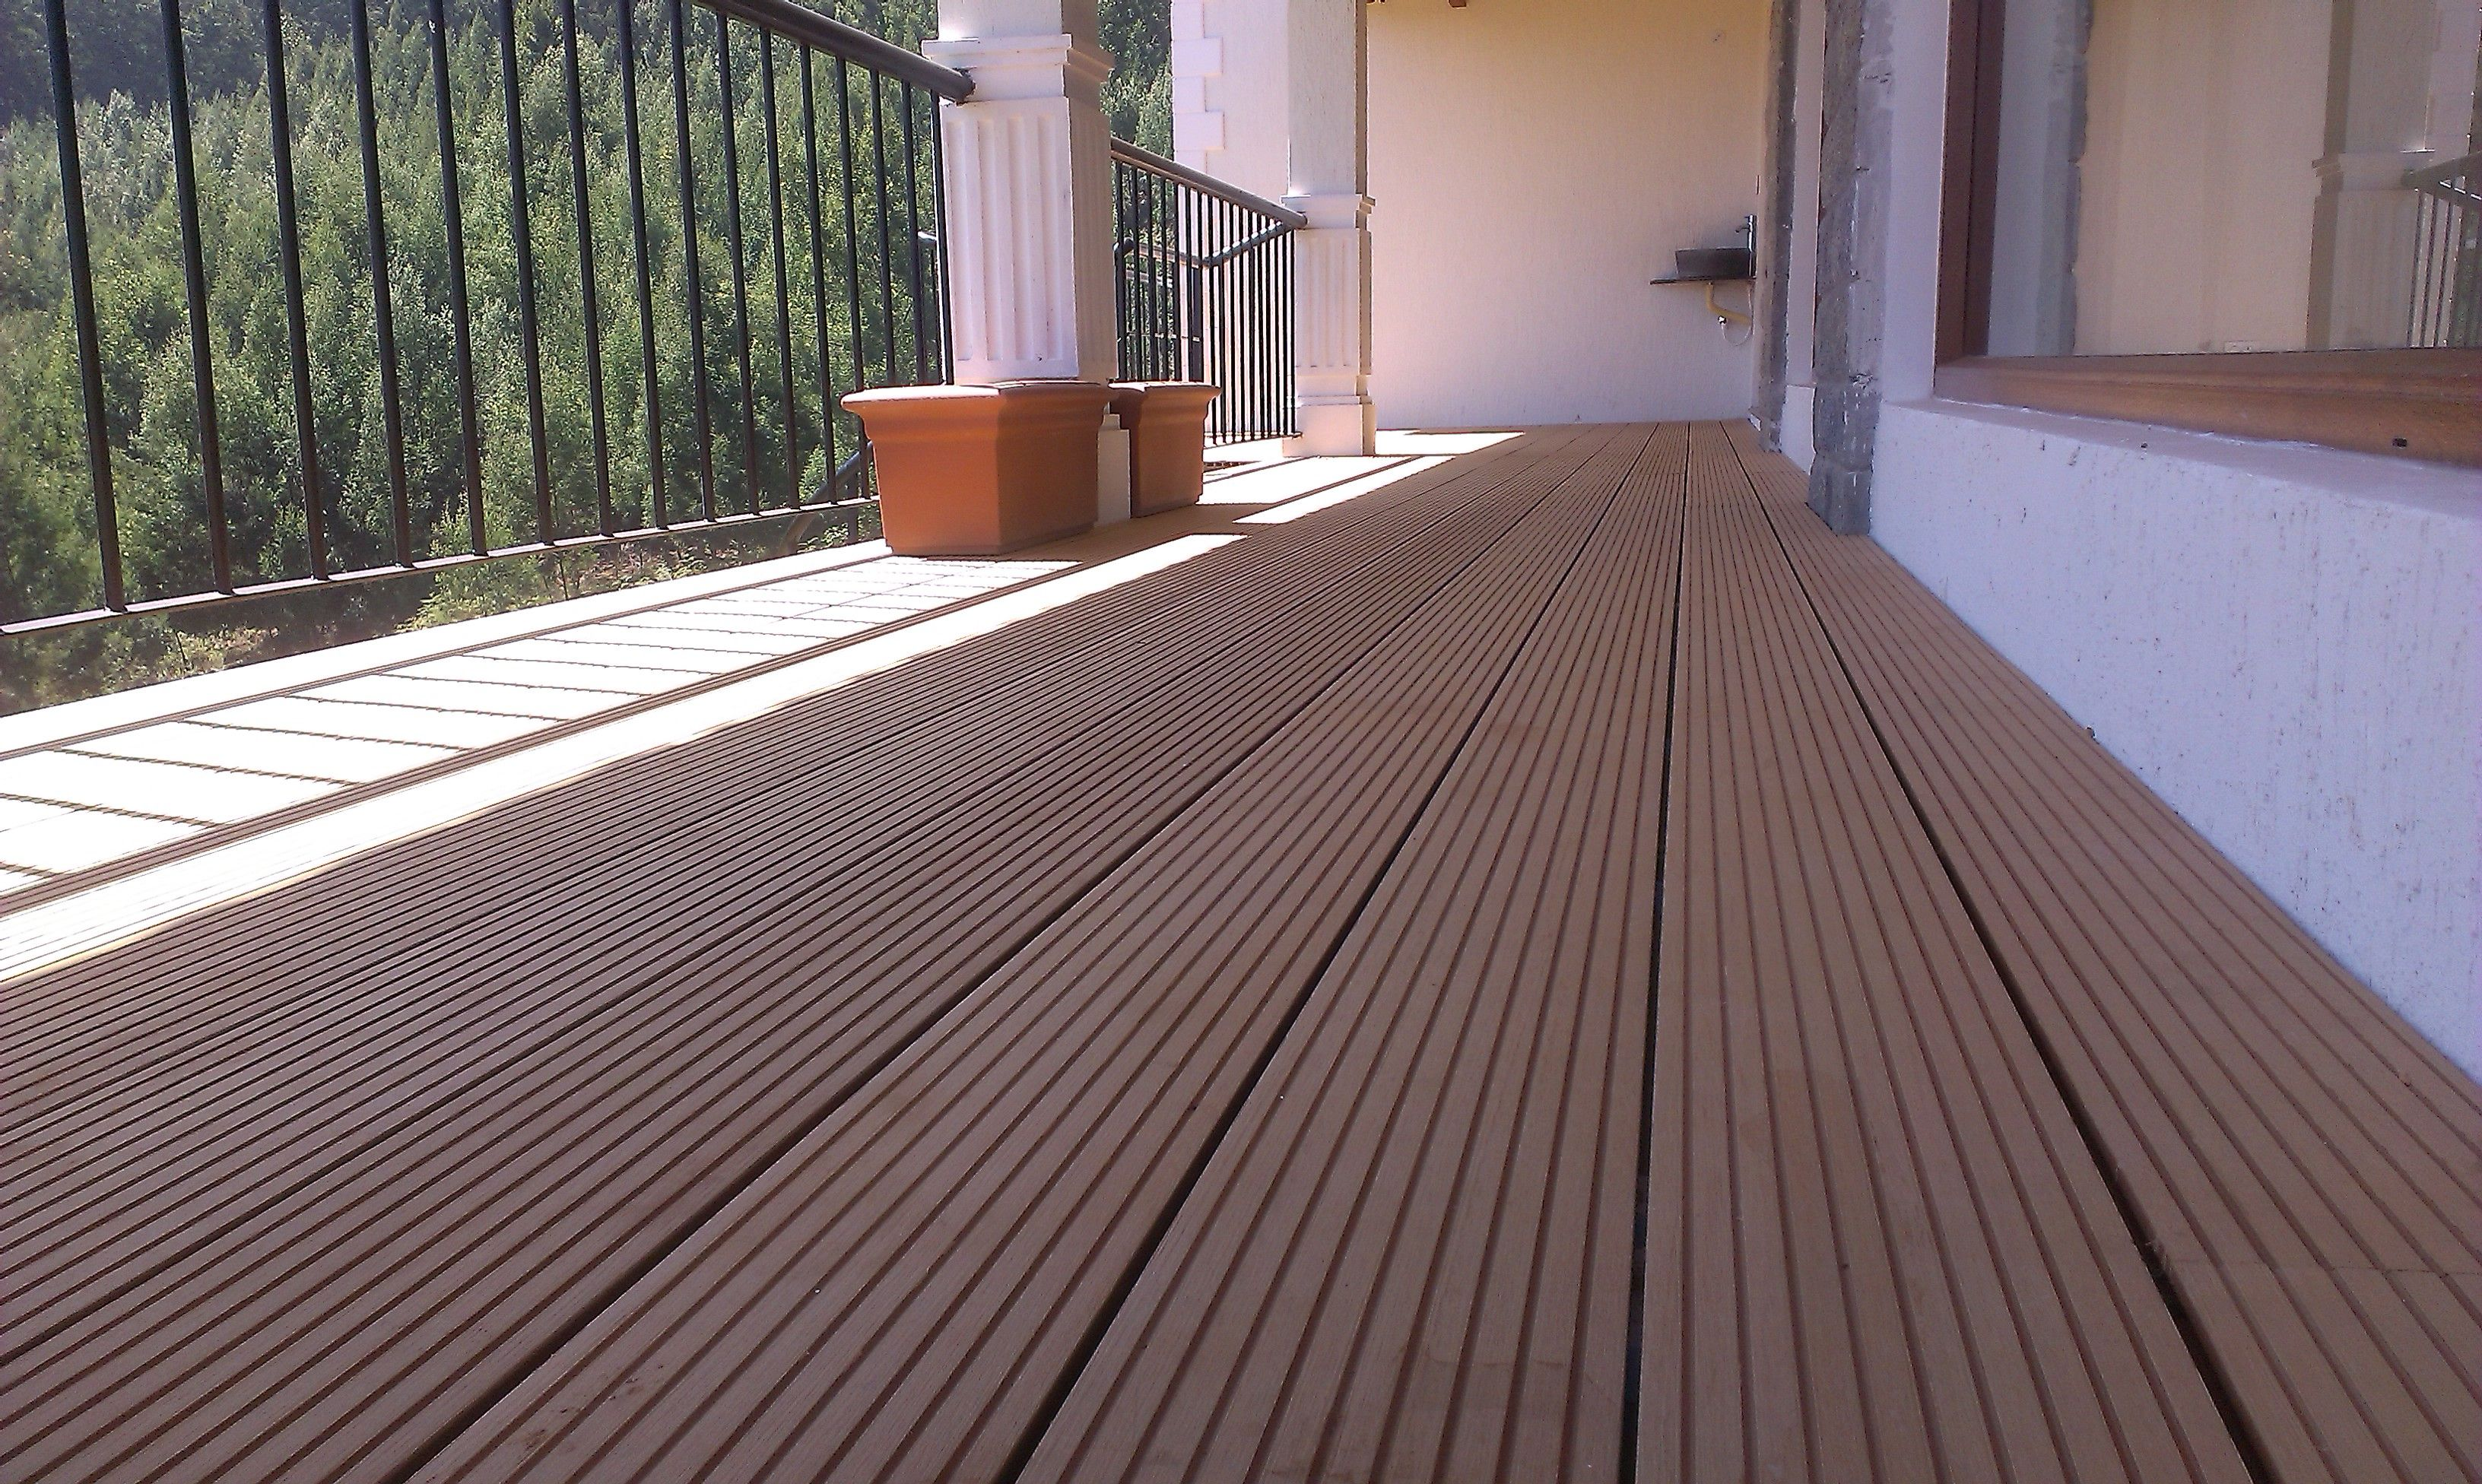 Timber Teck Decking At Menards Horizon Decking Reviews Mildew Proof Cheap Wood Composite Decking Boards In Dubai Composite Decking Outdoor Wood Flooring Deck